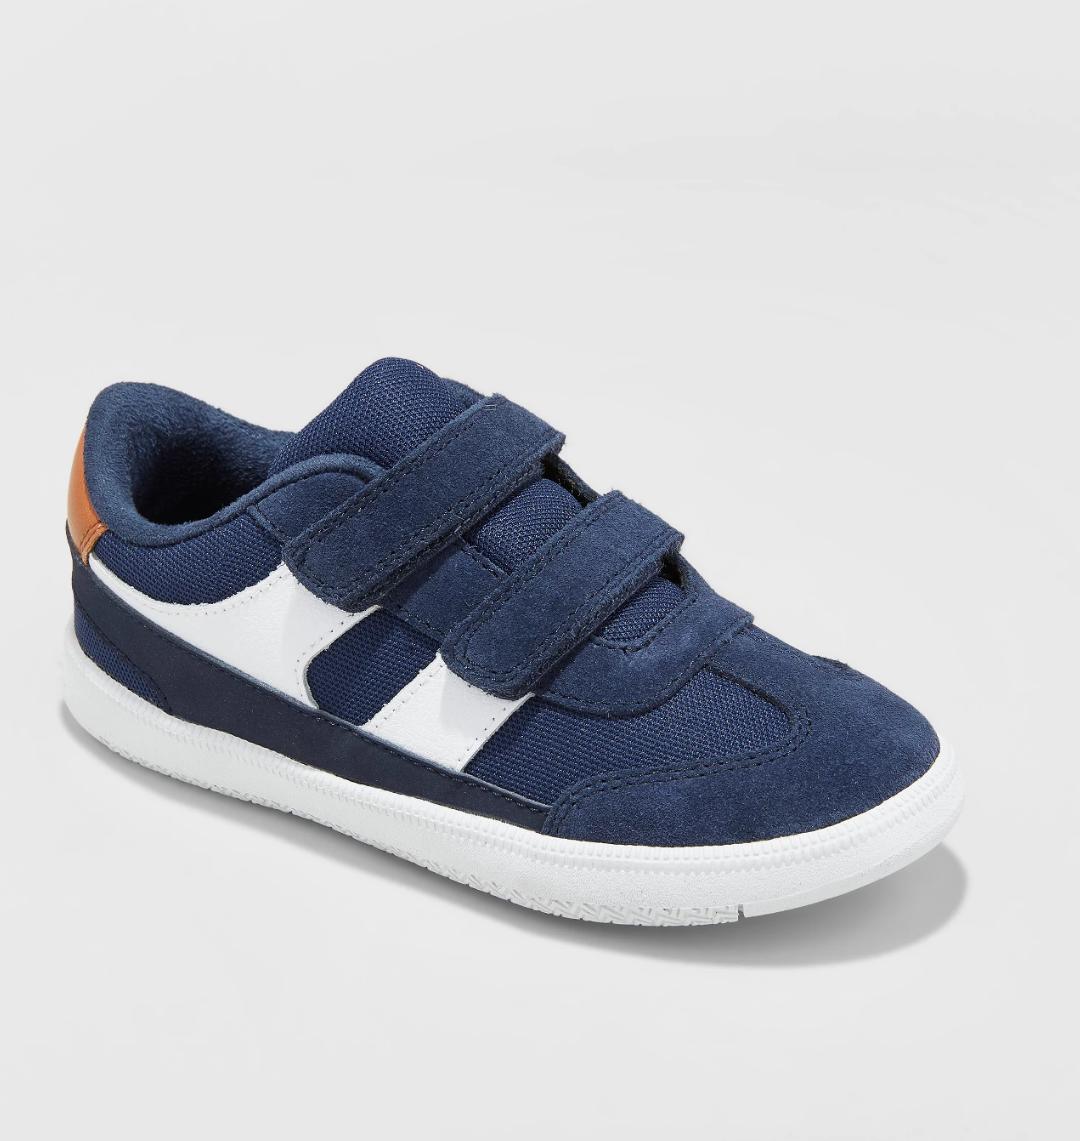 Cat & Jack Suede Sneakers